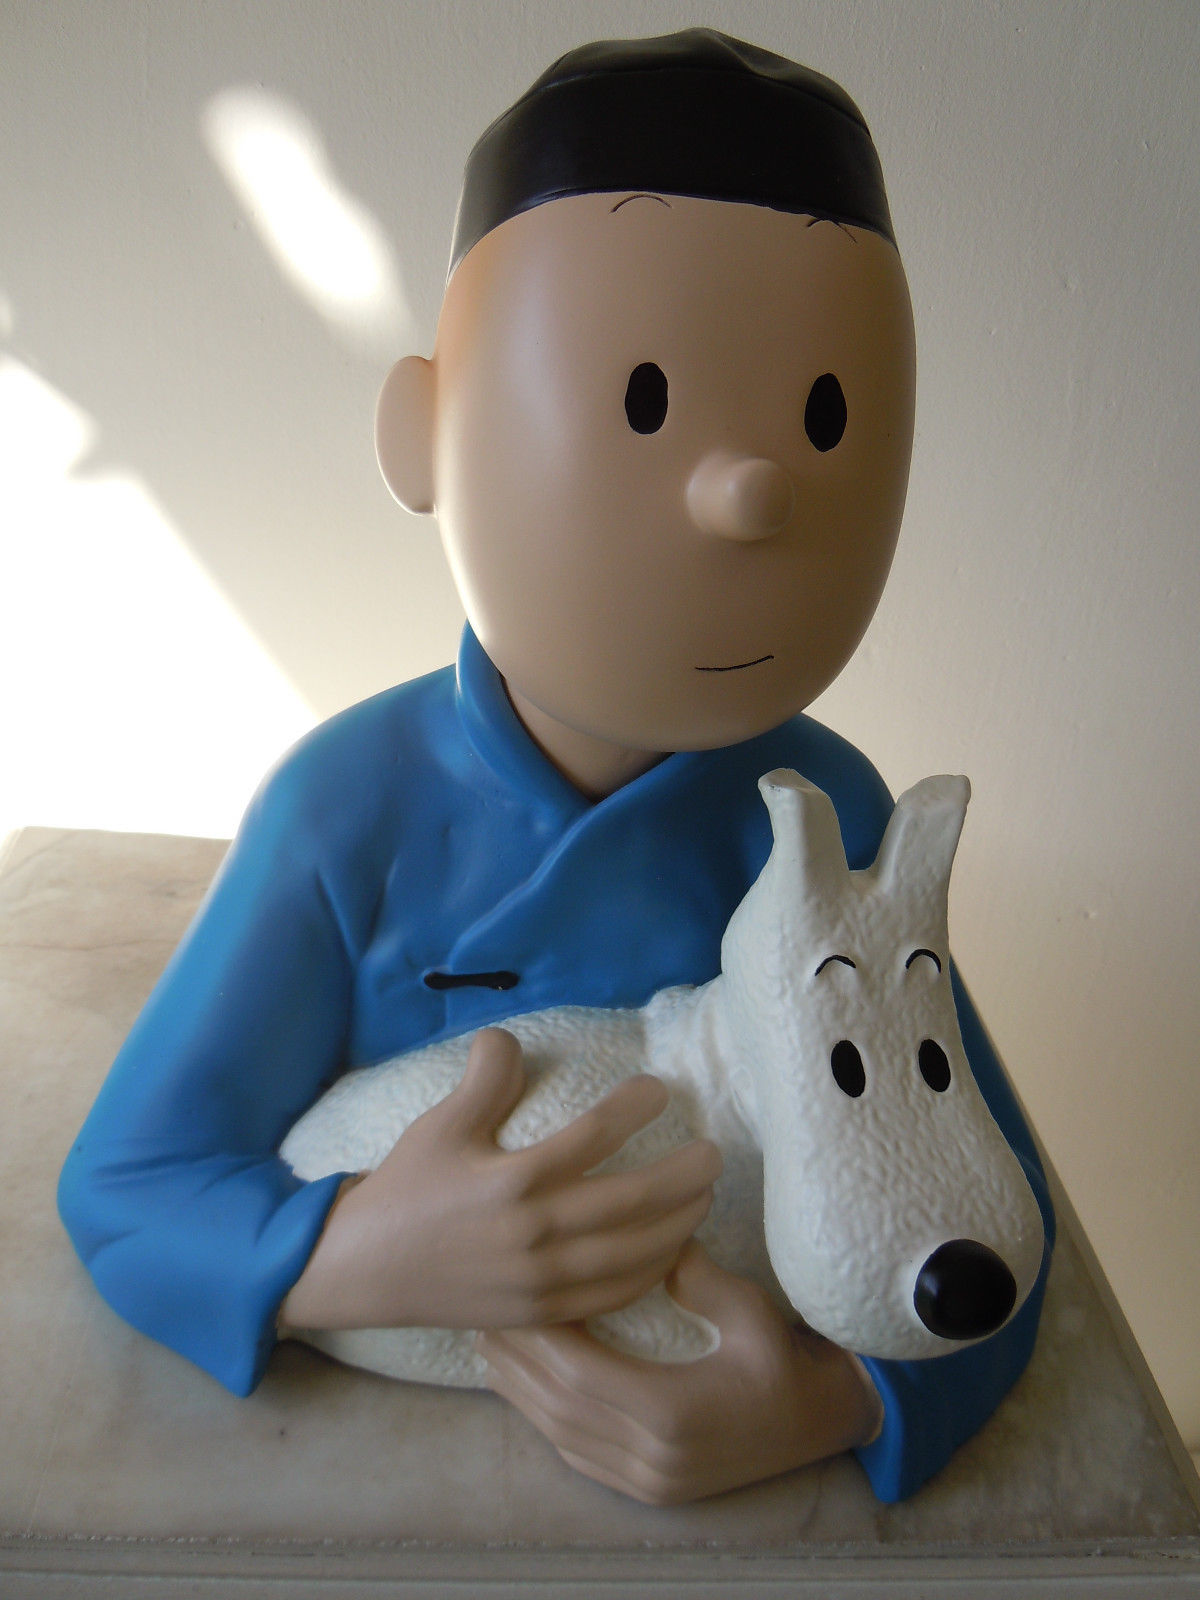 Buste de Tintin Le lotus bleu no leblon-no pixi-très bon état